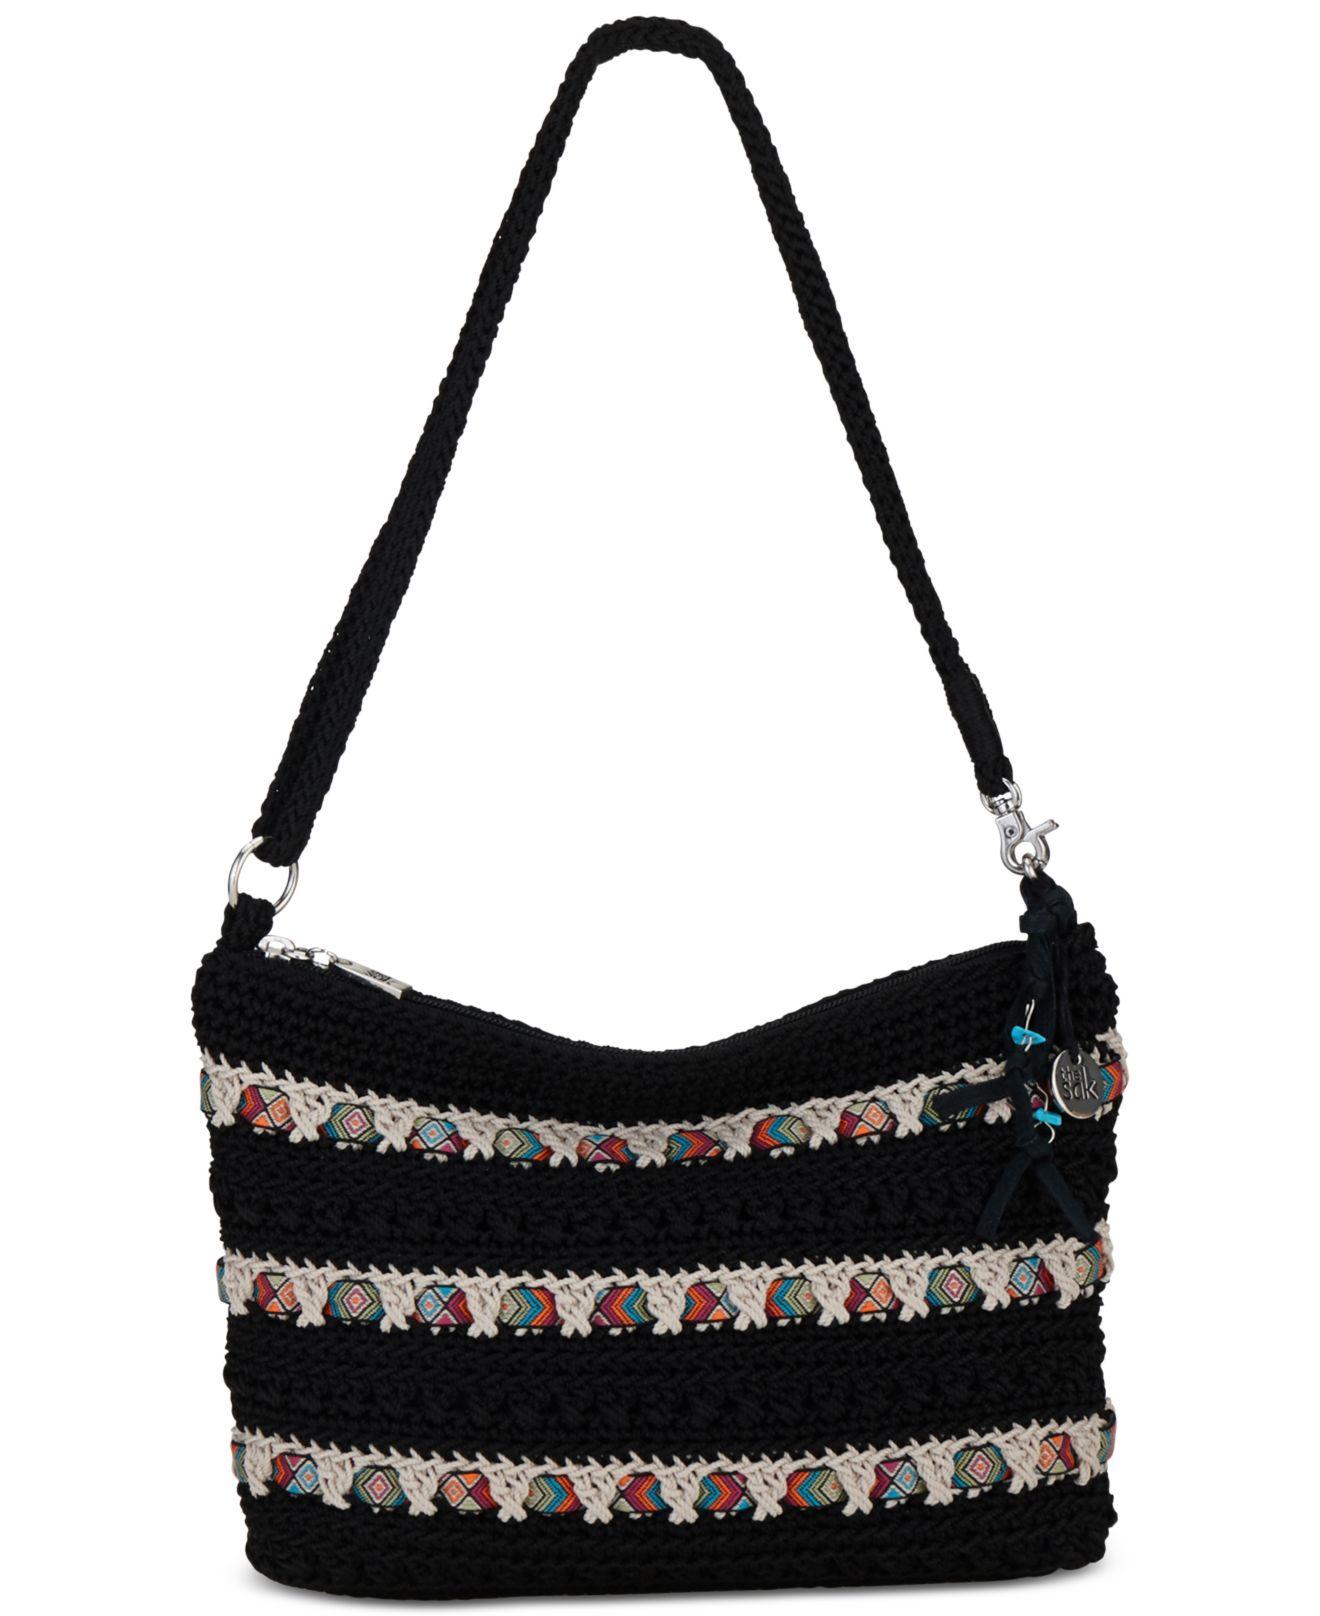 Sak Crochet Bag : The sak Classic Mini 3-in-1 Crochet Clutch in Black Lyst